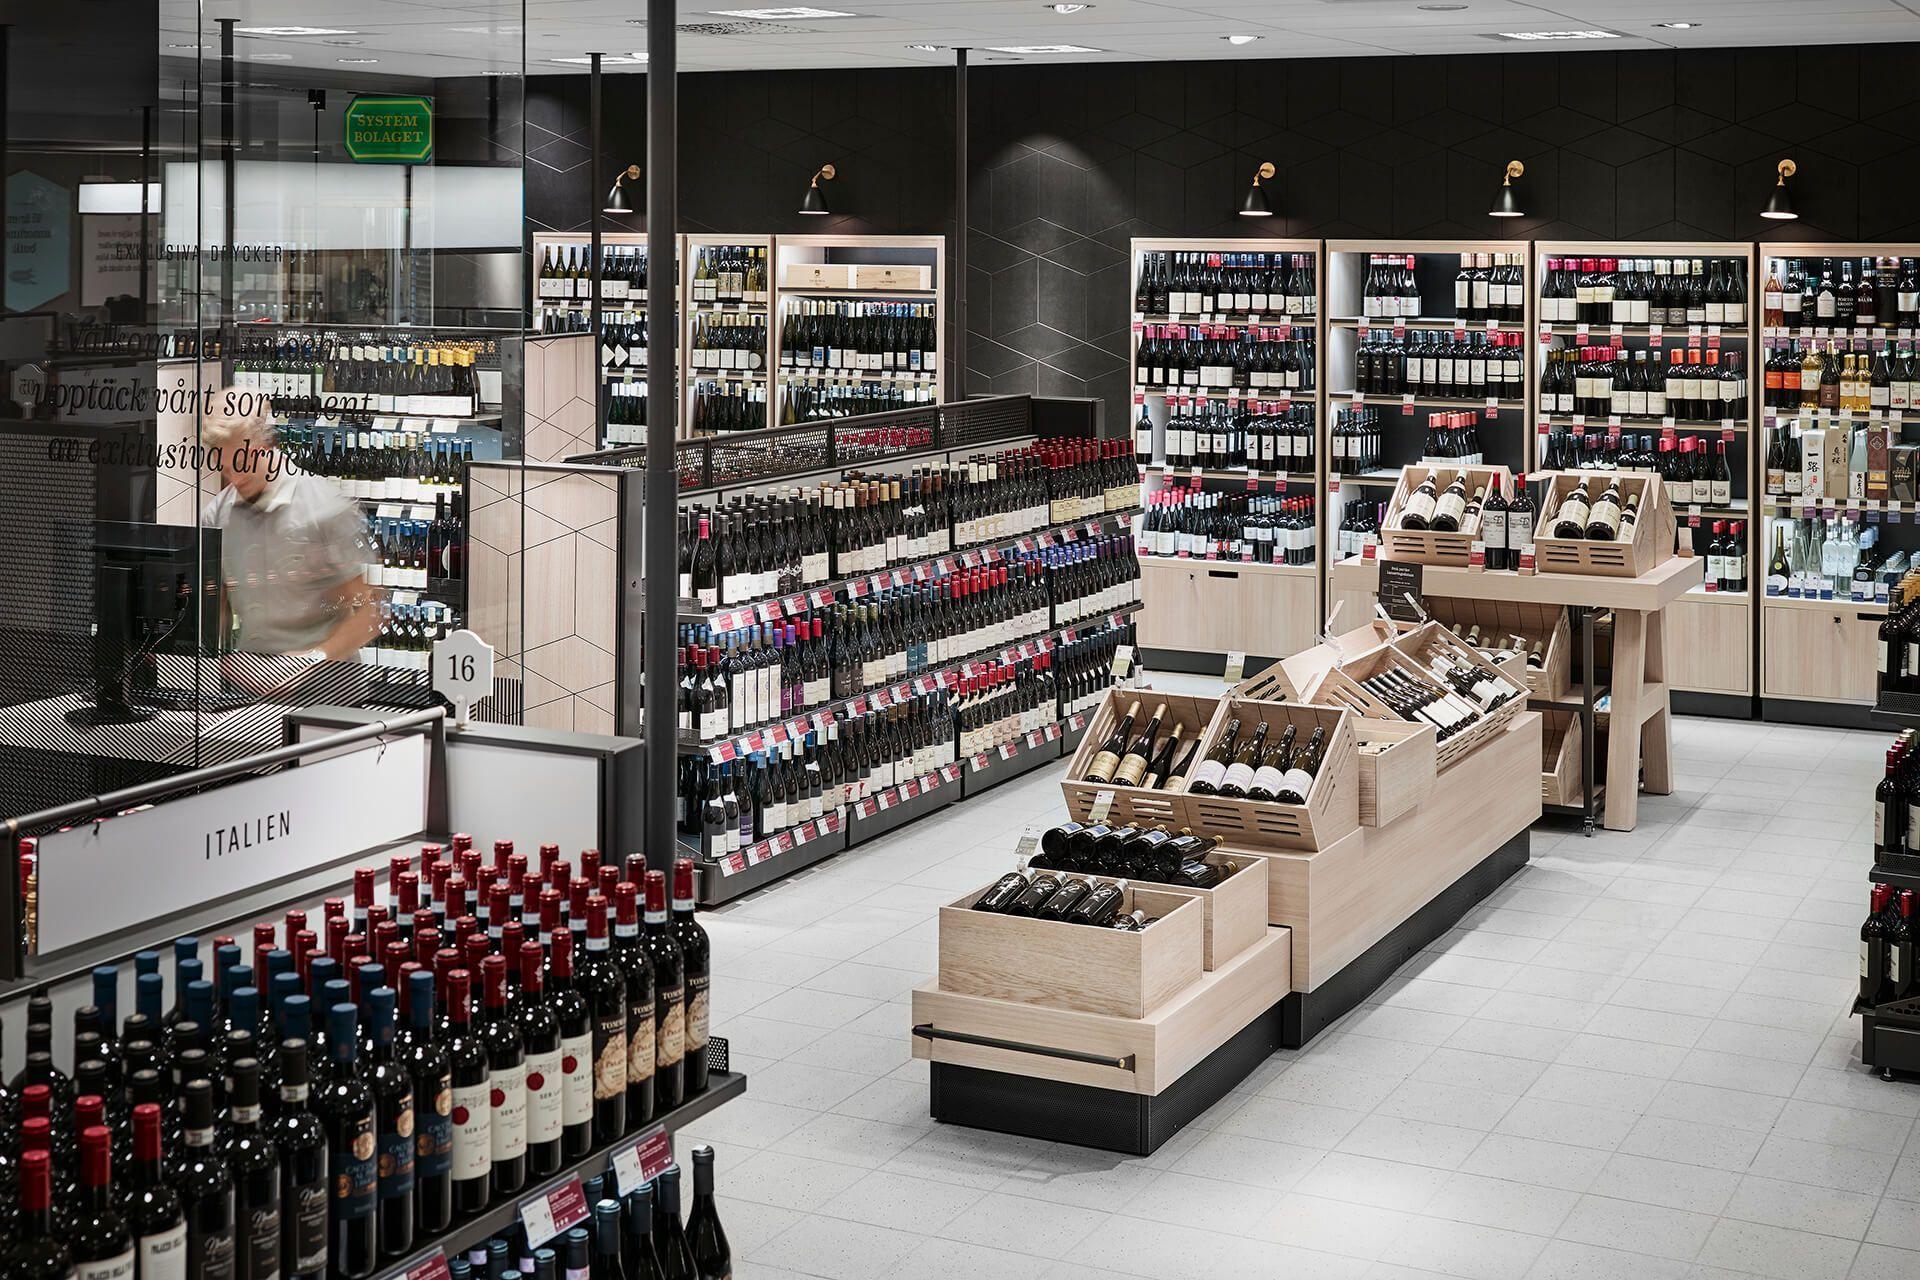 Systembolaget Caseimage Exklusiva Drycker Oversikt 3 Hansa In 2020 Wine And Spirits Store Store Layout Repurposed Wine Bottles